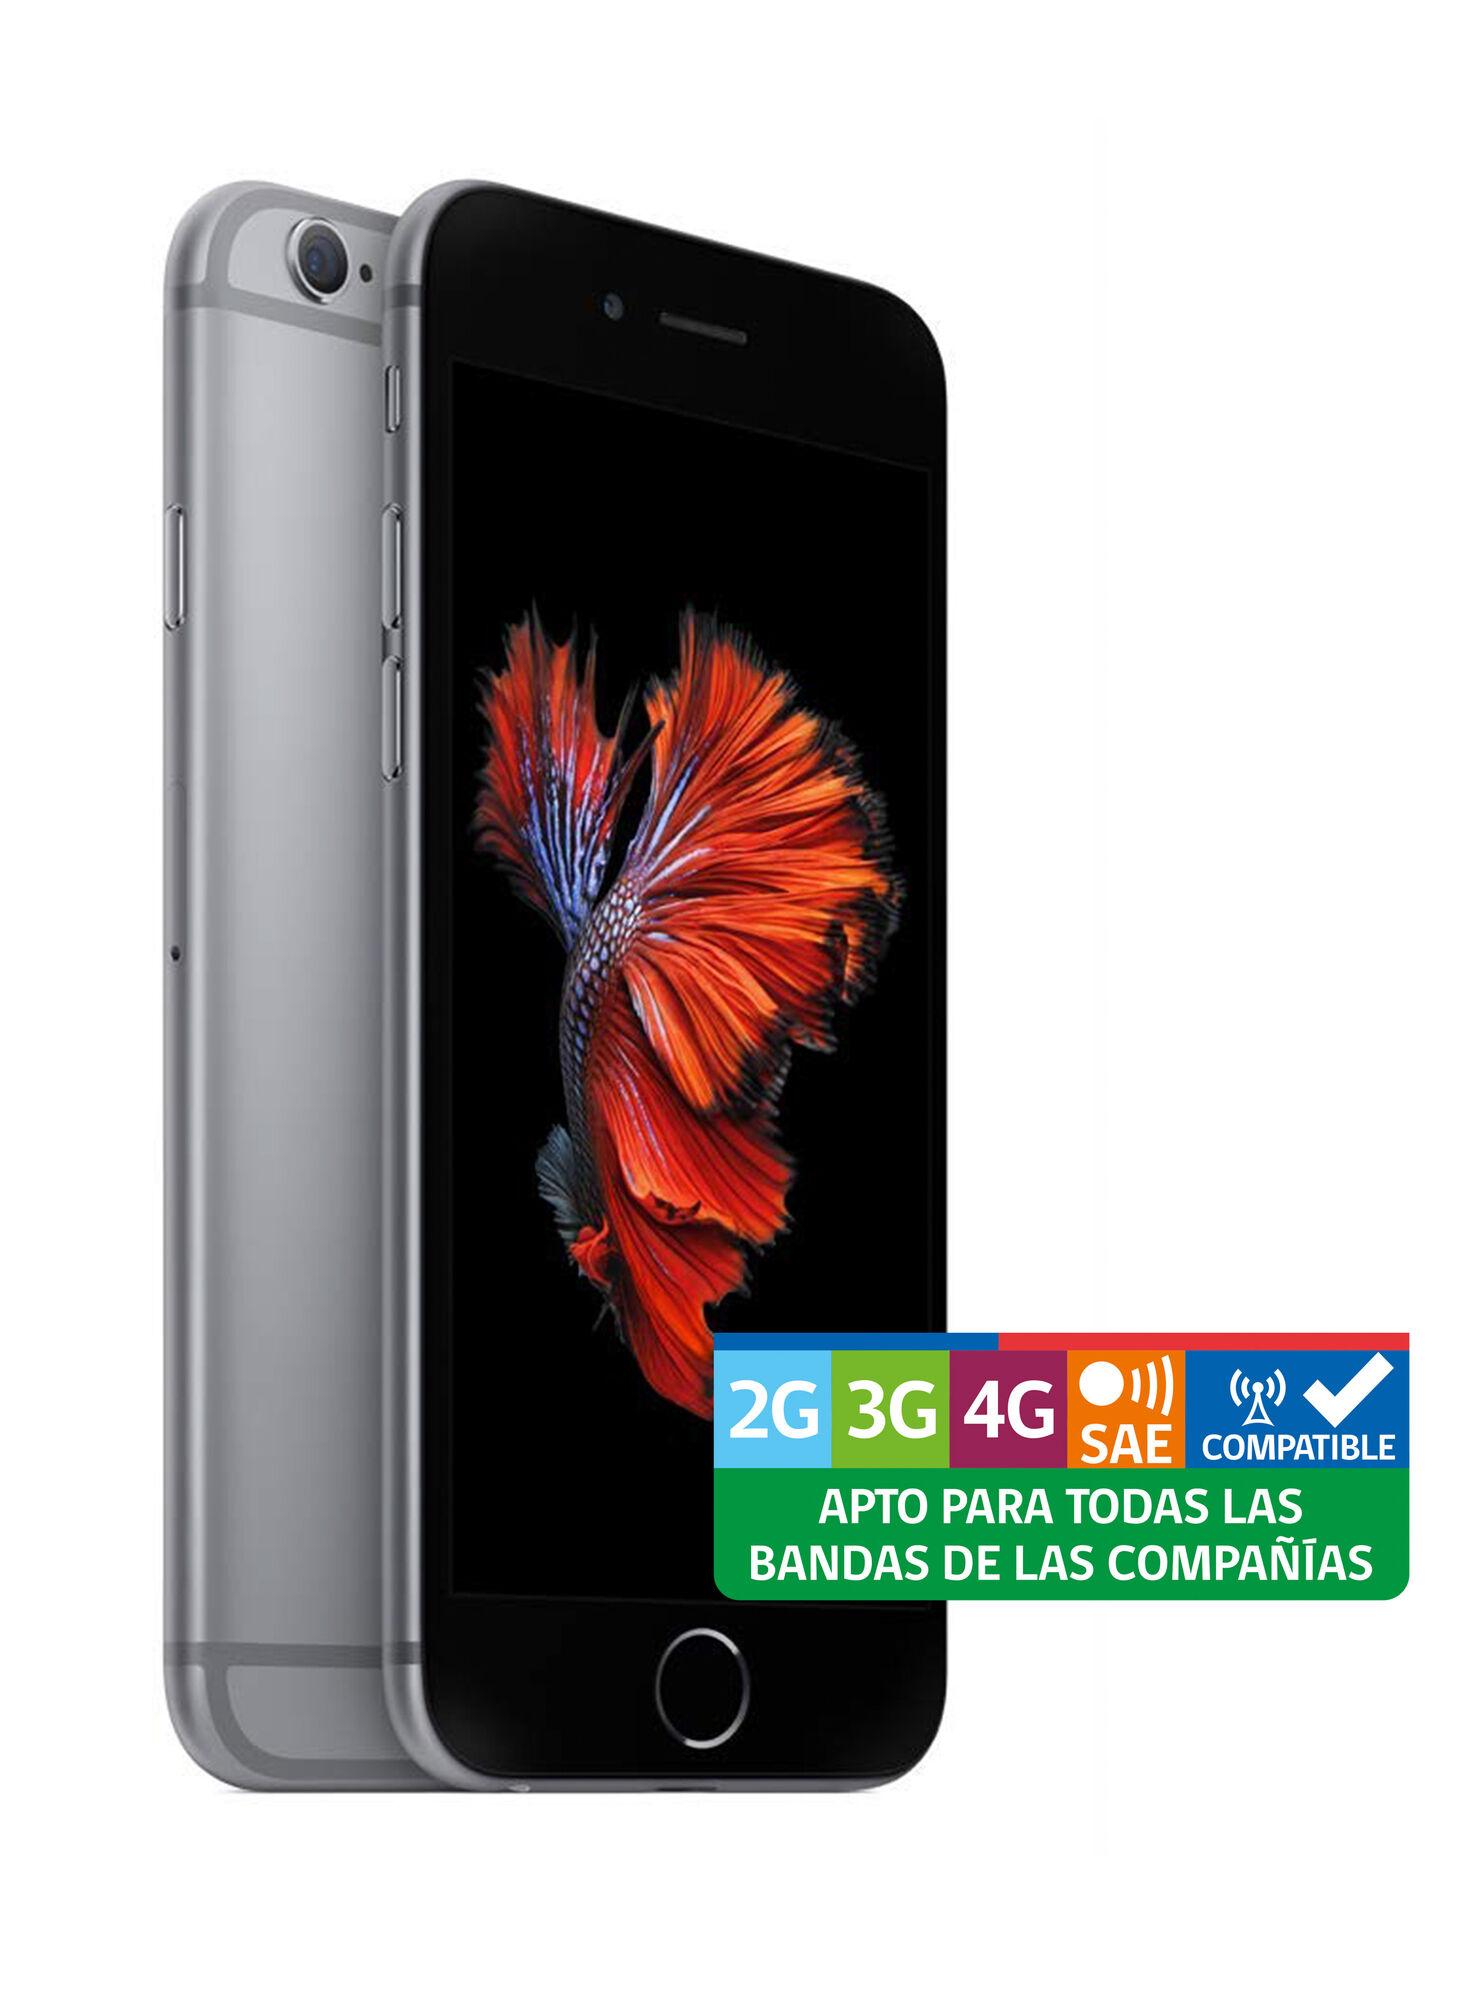 cf4dfb289e8 iPhone 6S Space Gray 32GB Liberado en Apple | Paris